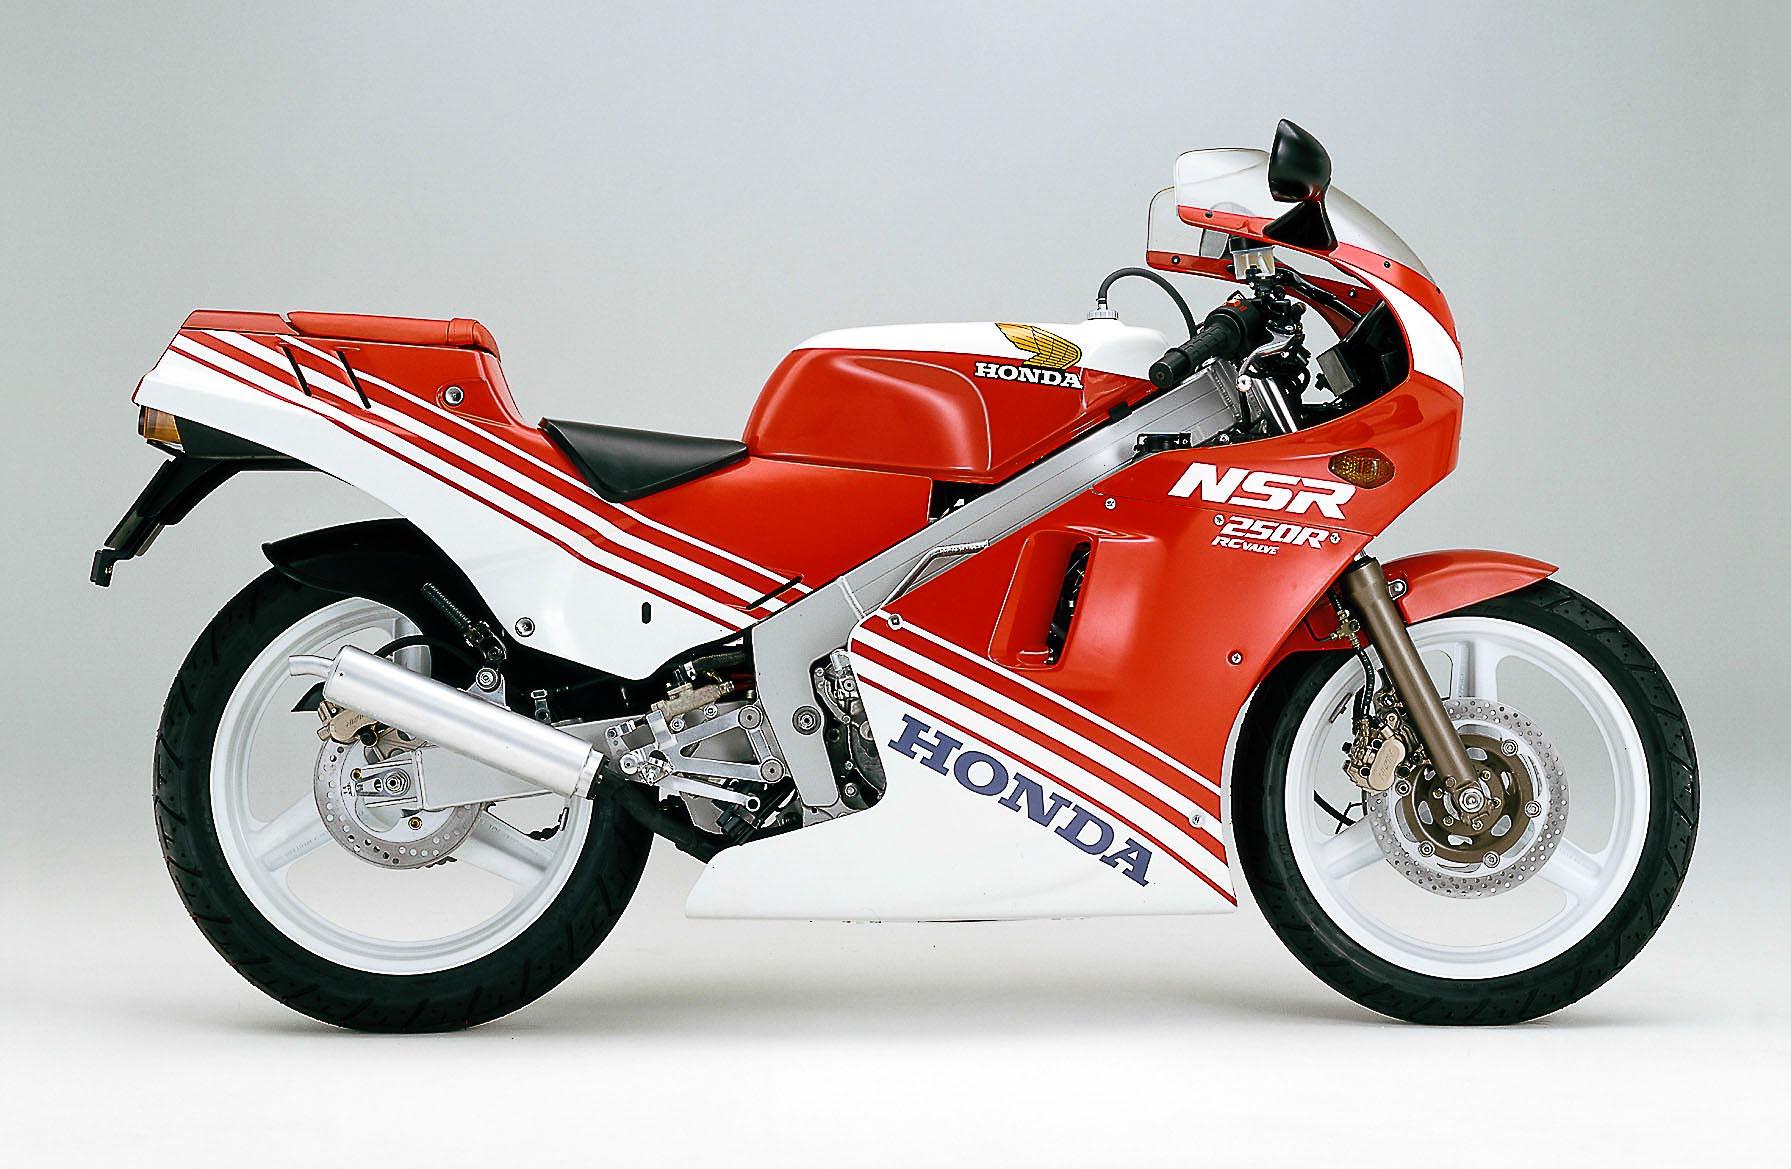 HONDA NSR 250 (1985-1987)